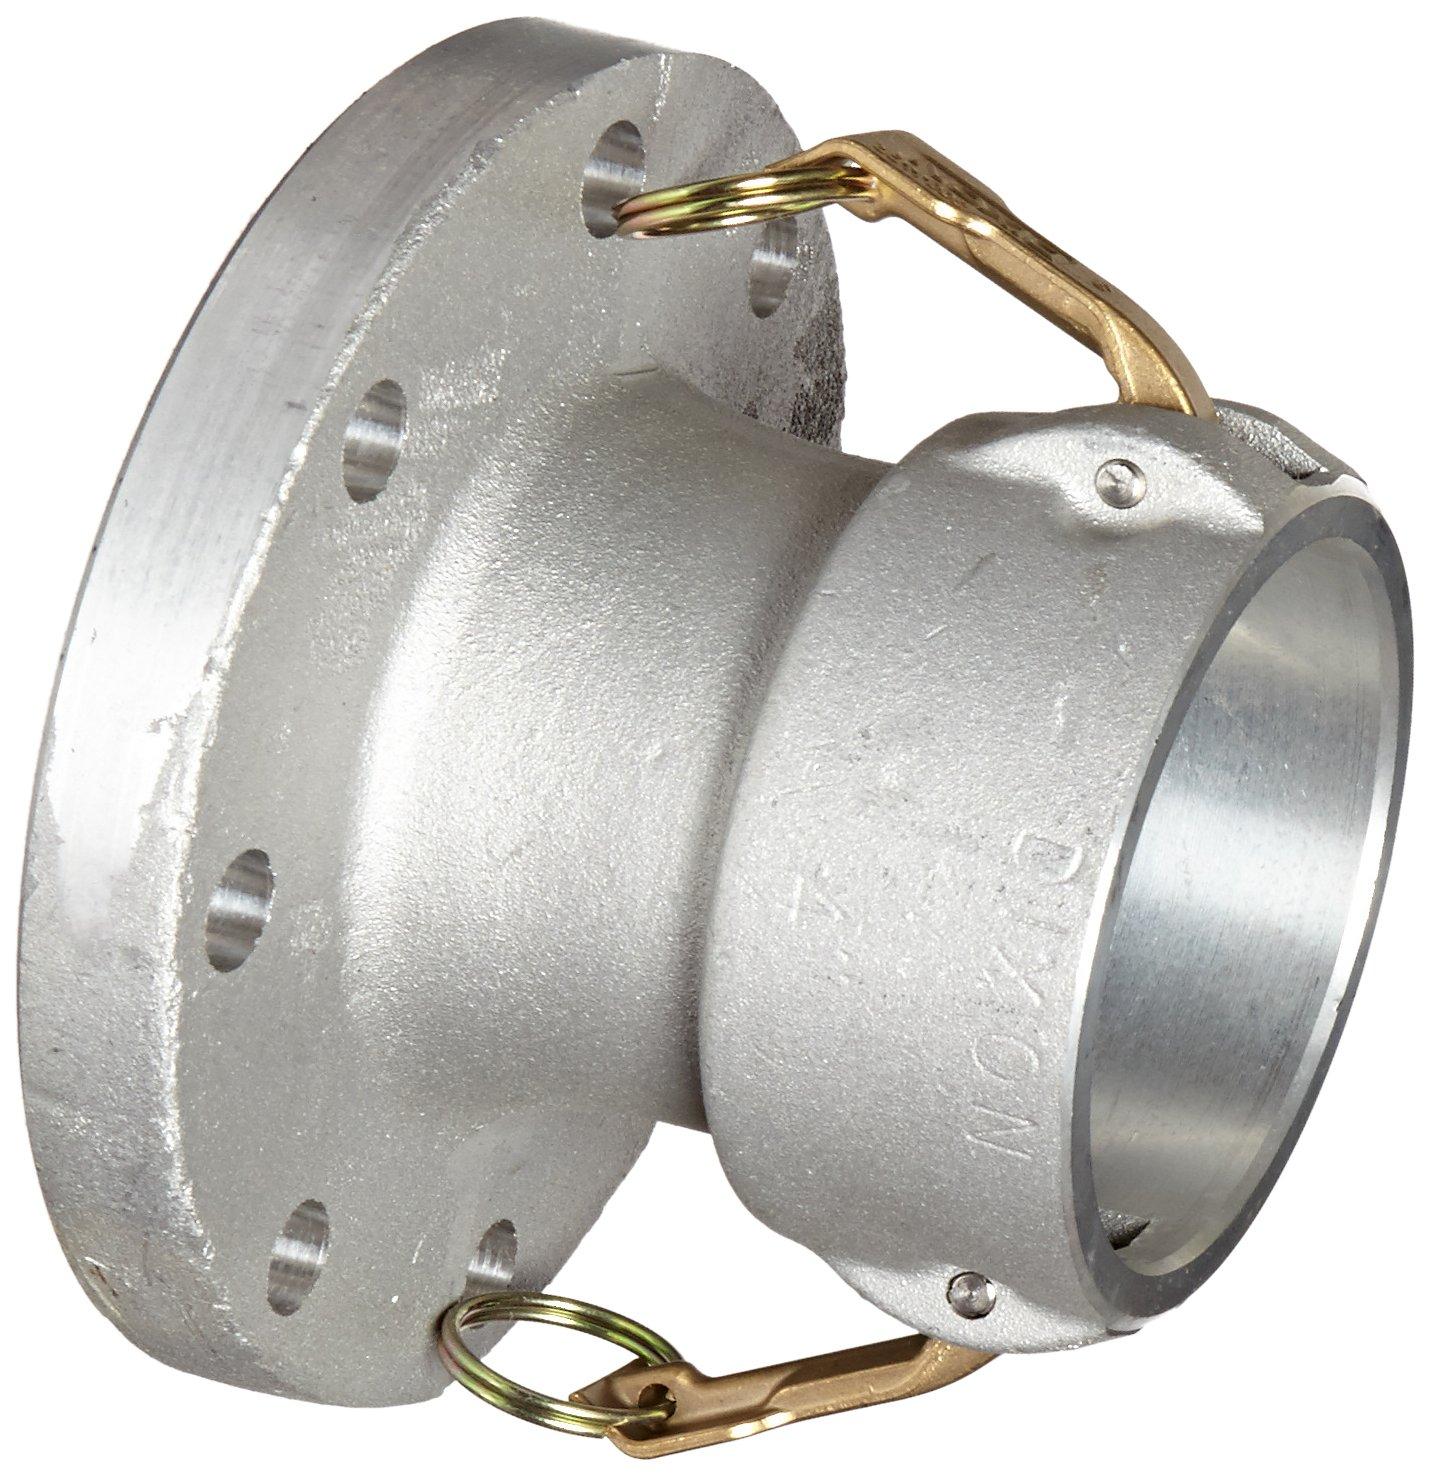 Dixon 600-DL-AL Aluminum Cam and Groove Hose Fitting 6 Socket x 150# ASA Flange